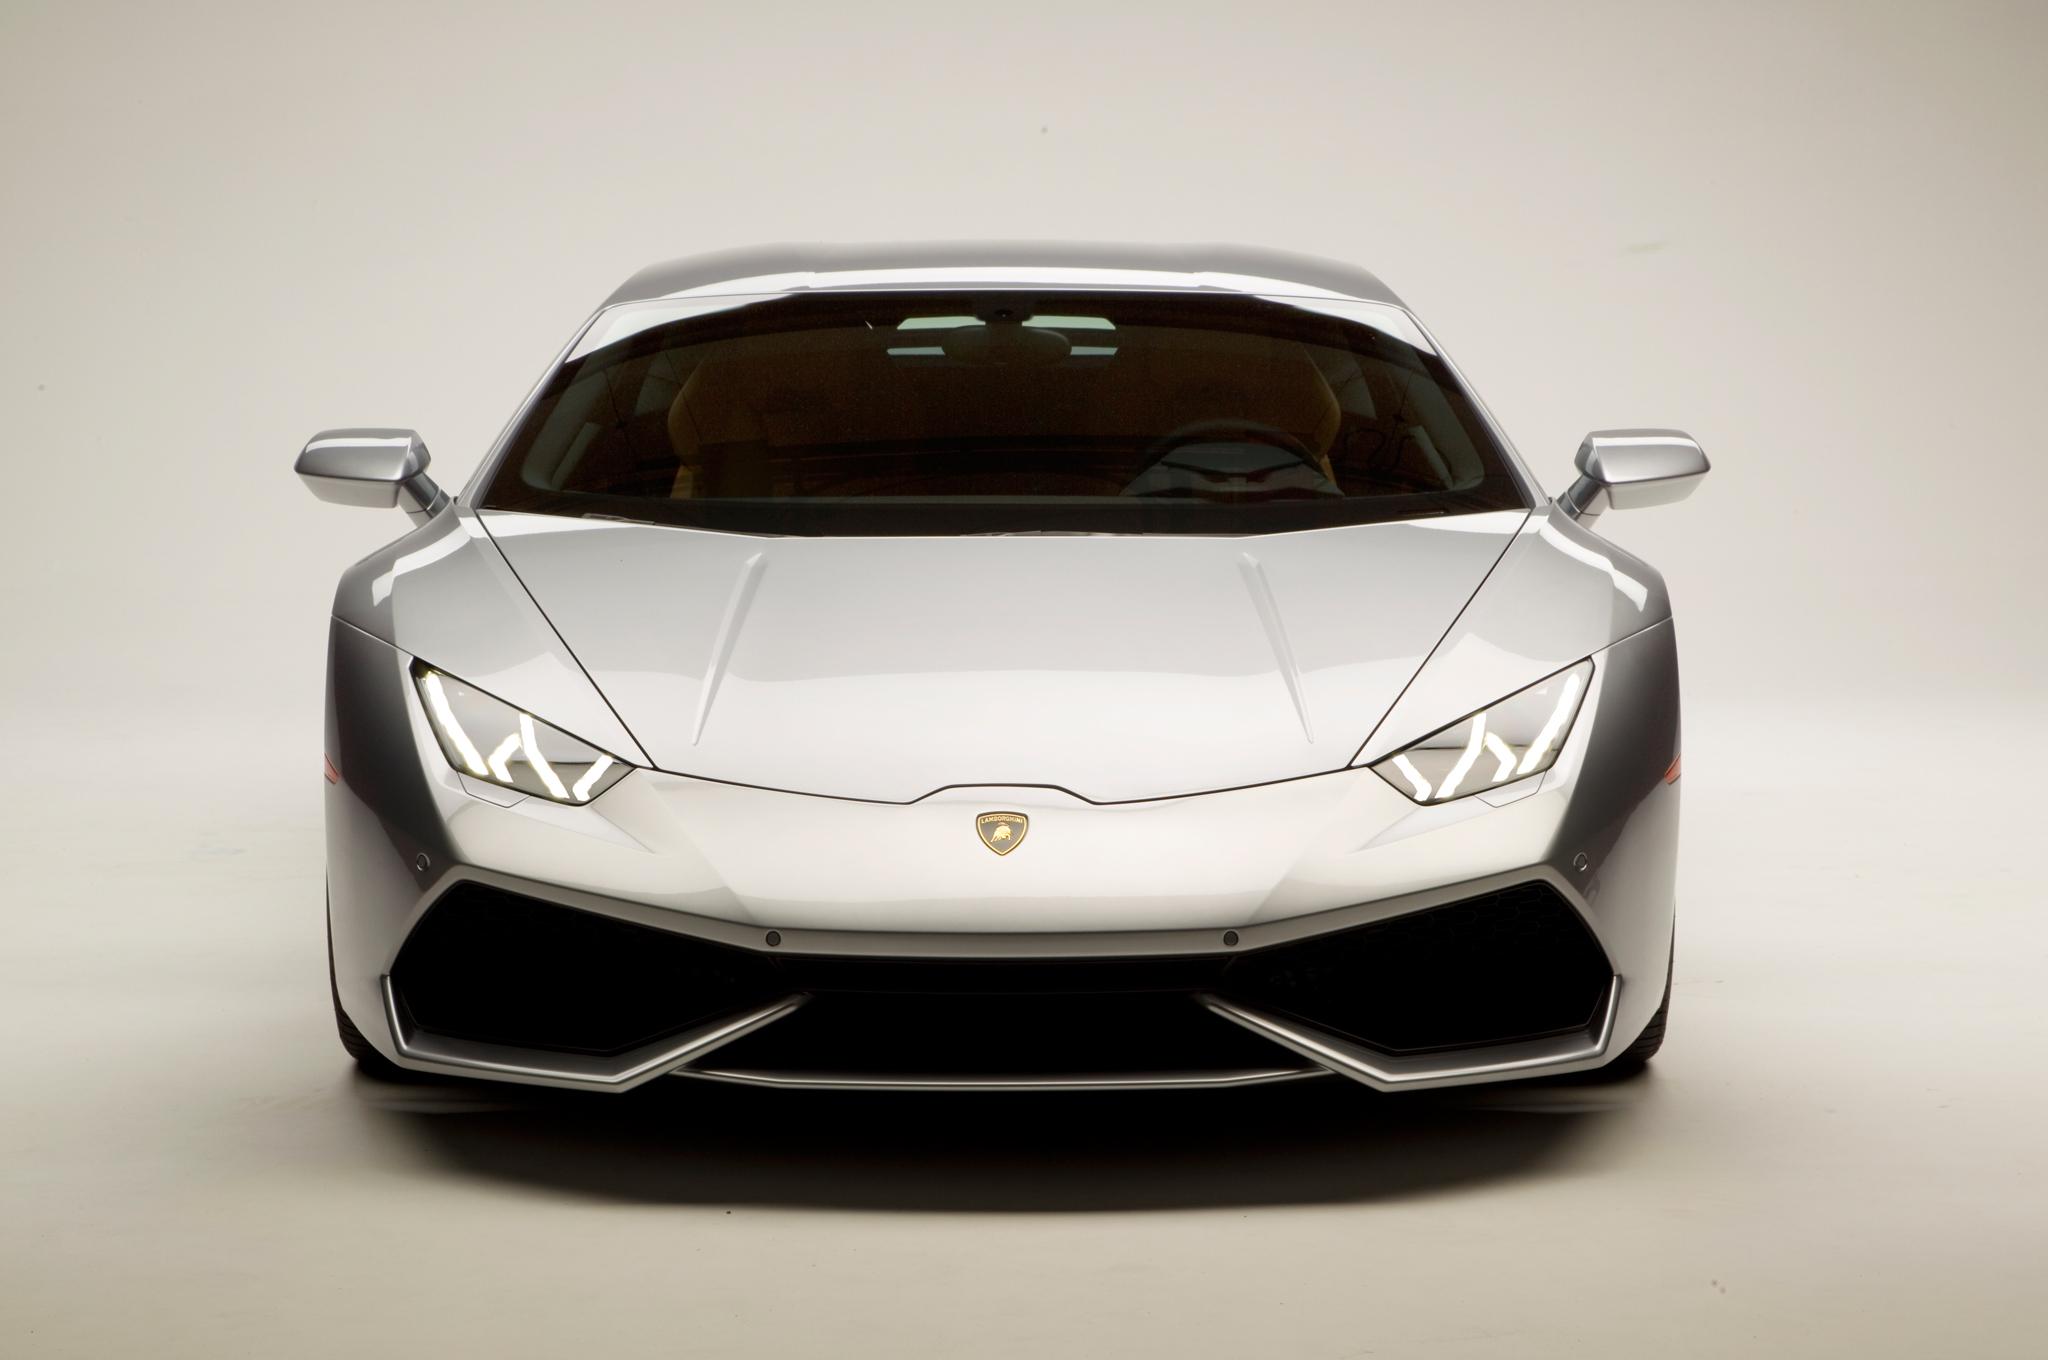 http---image.motortrend.com-f-roadtests-exotic-1312_2015_lamborghini_huracan_first_look-59412095-2015-Lamborghini-Huracan-silver-front-end